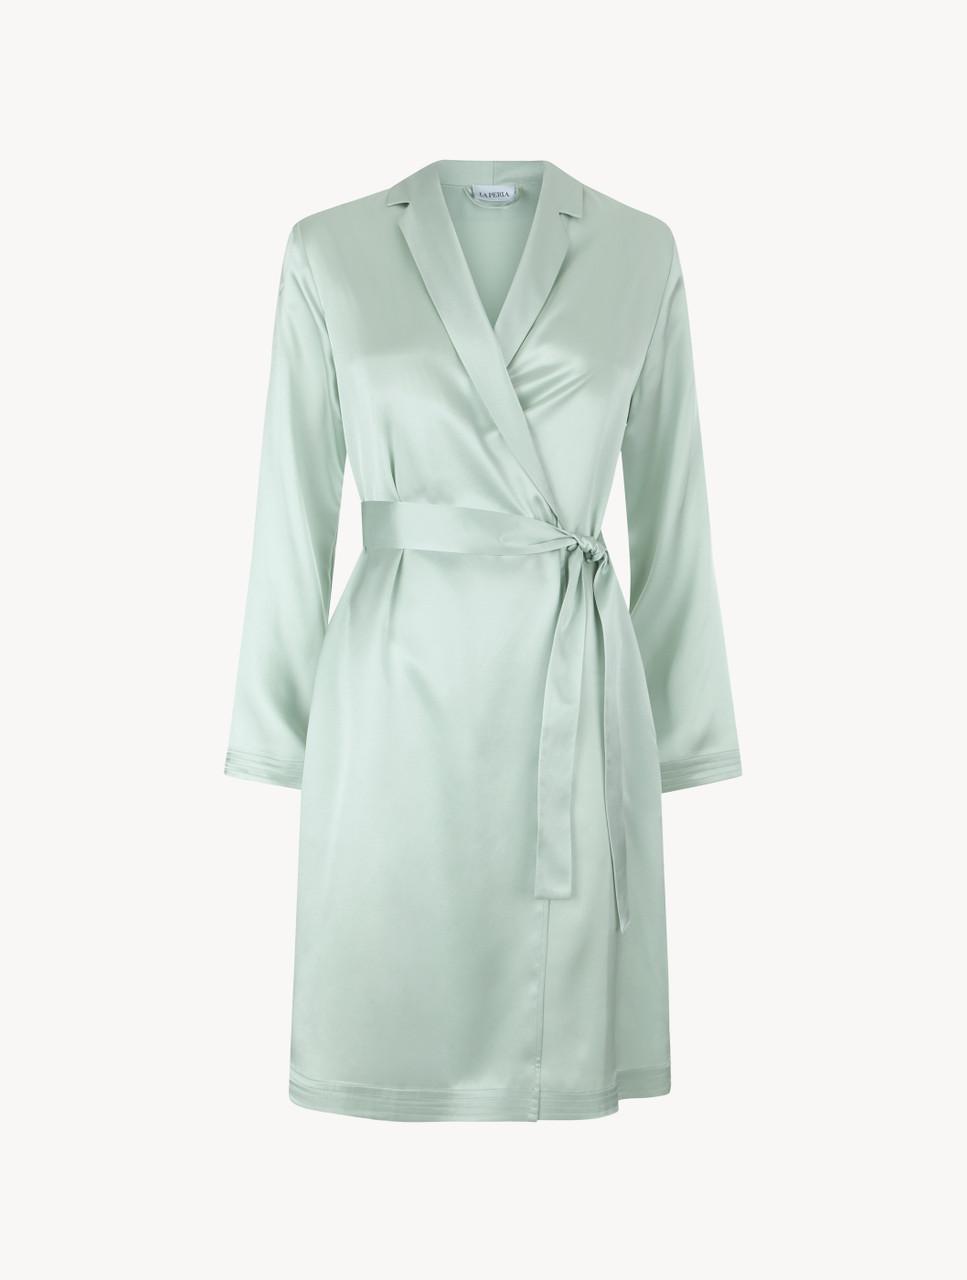 Mint Green Silk Short Robe La Perla Uk